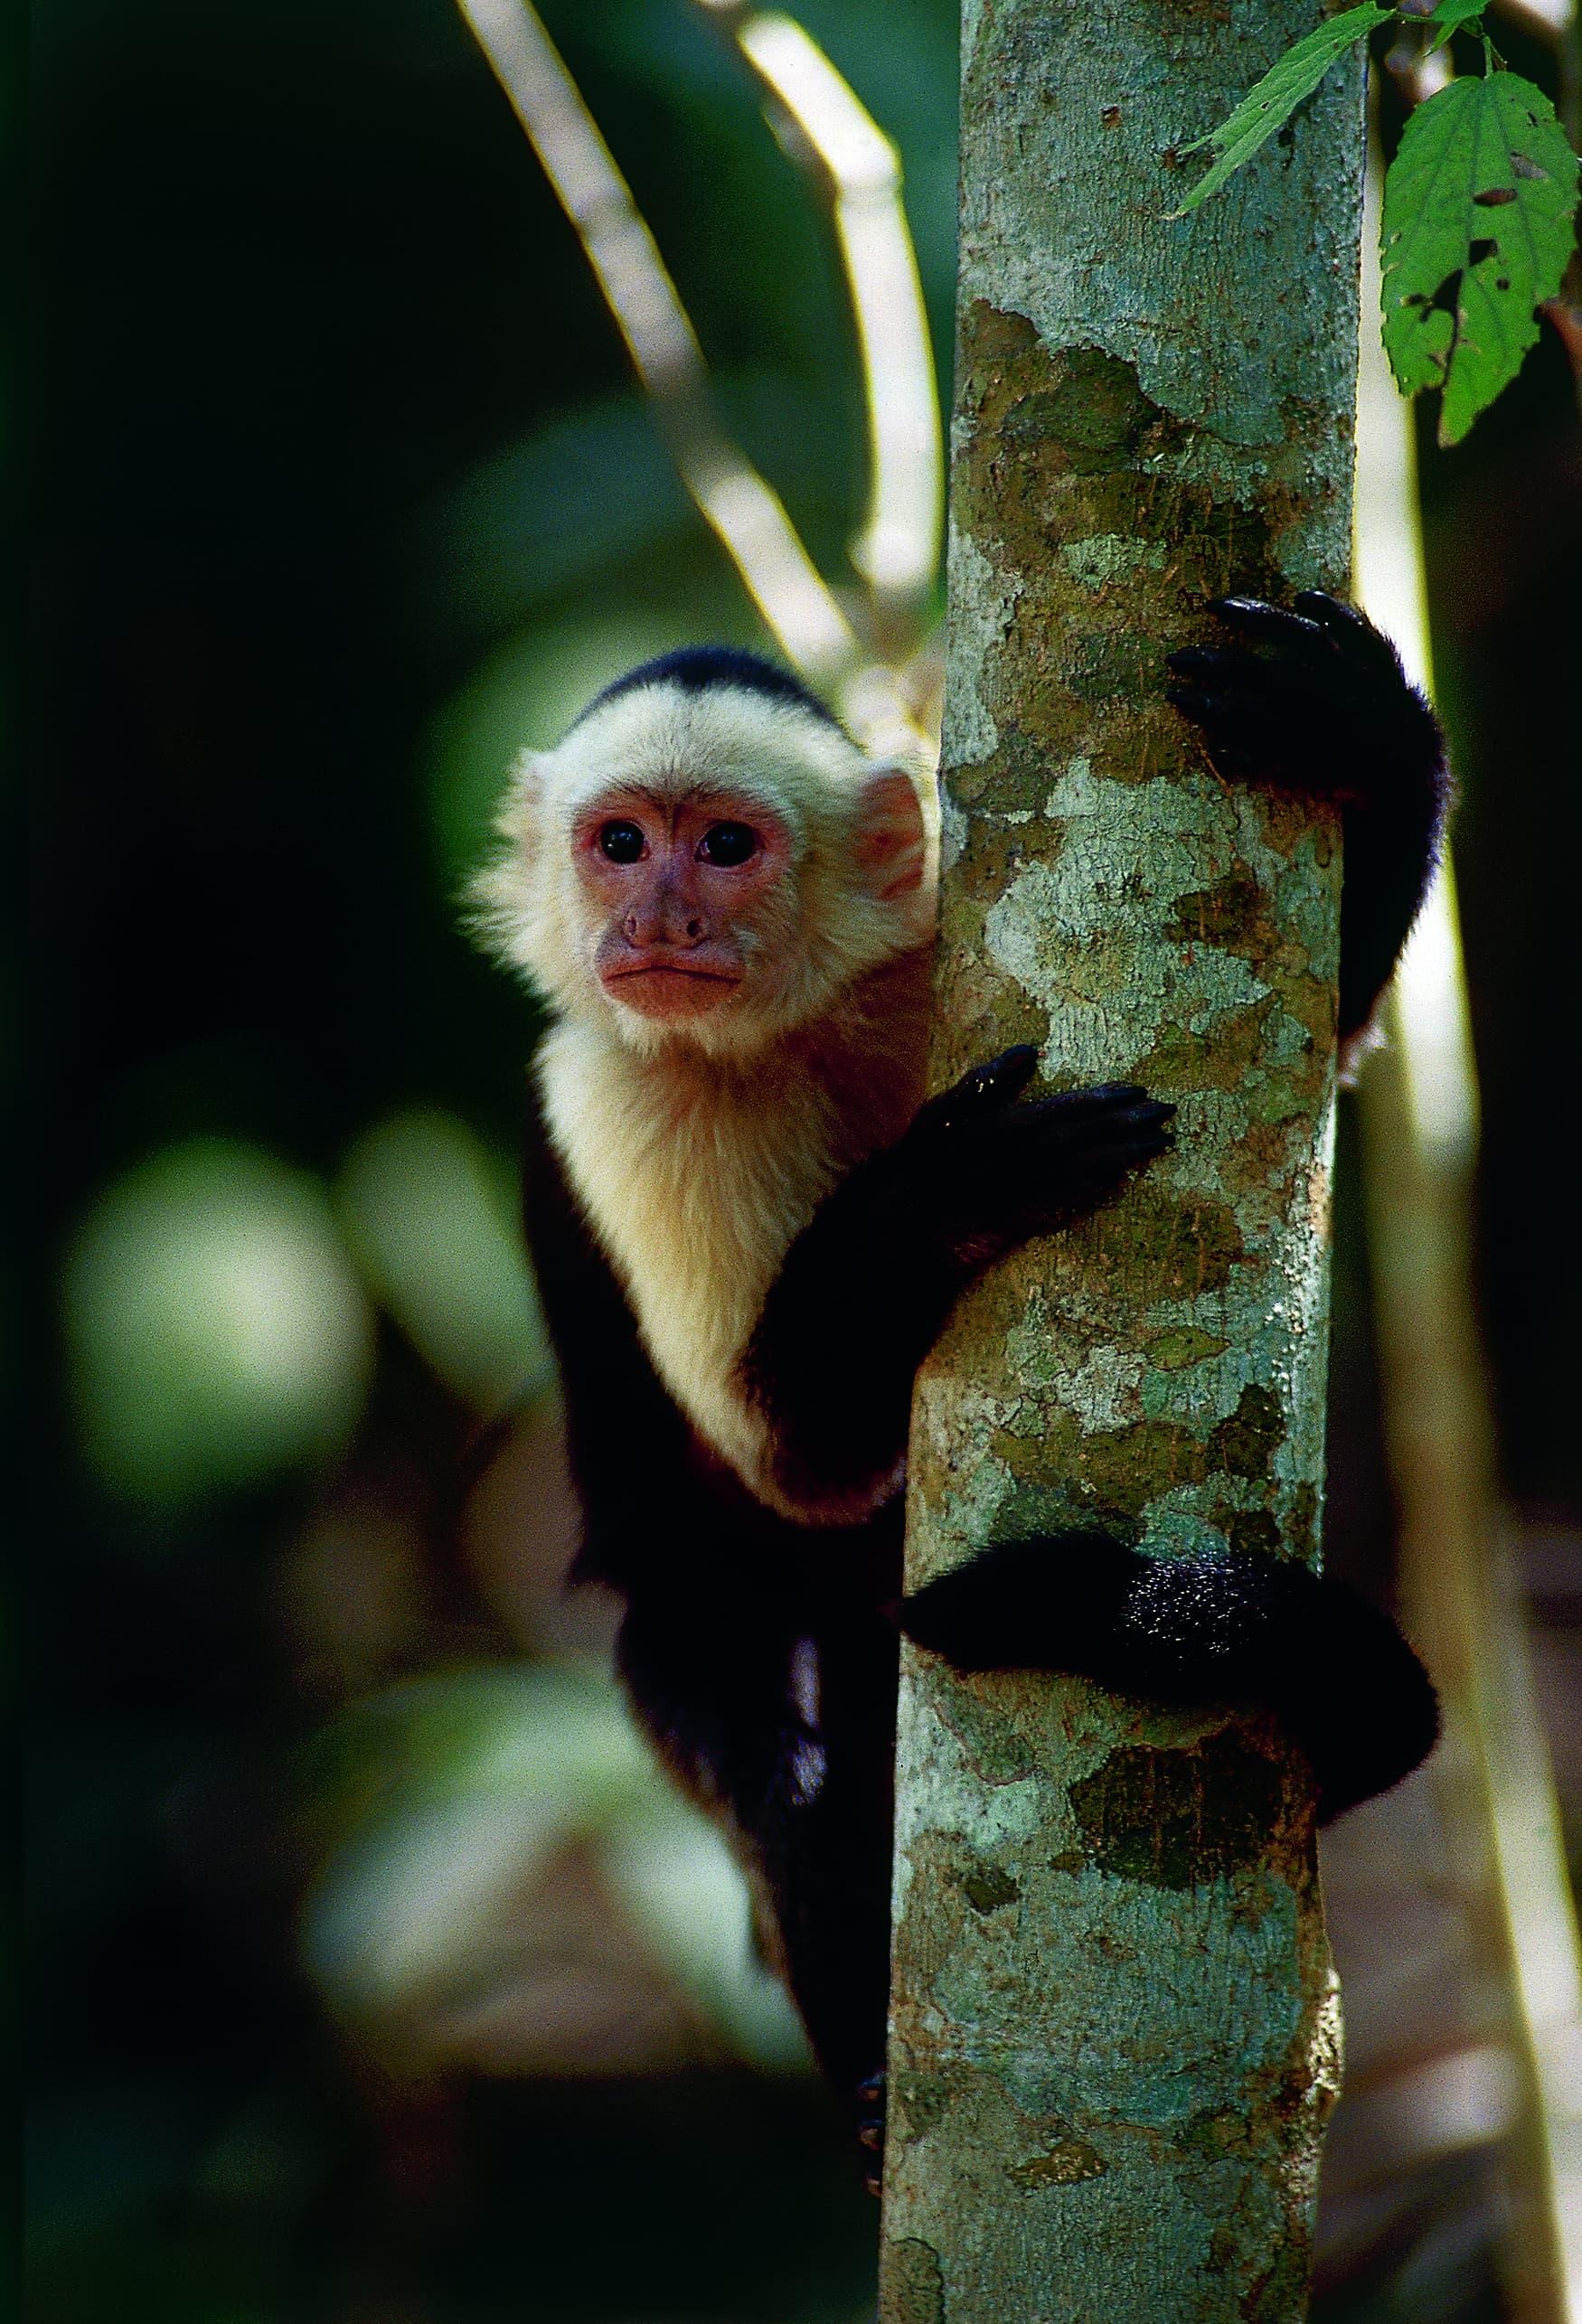 Affe blickt in Kamera